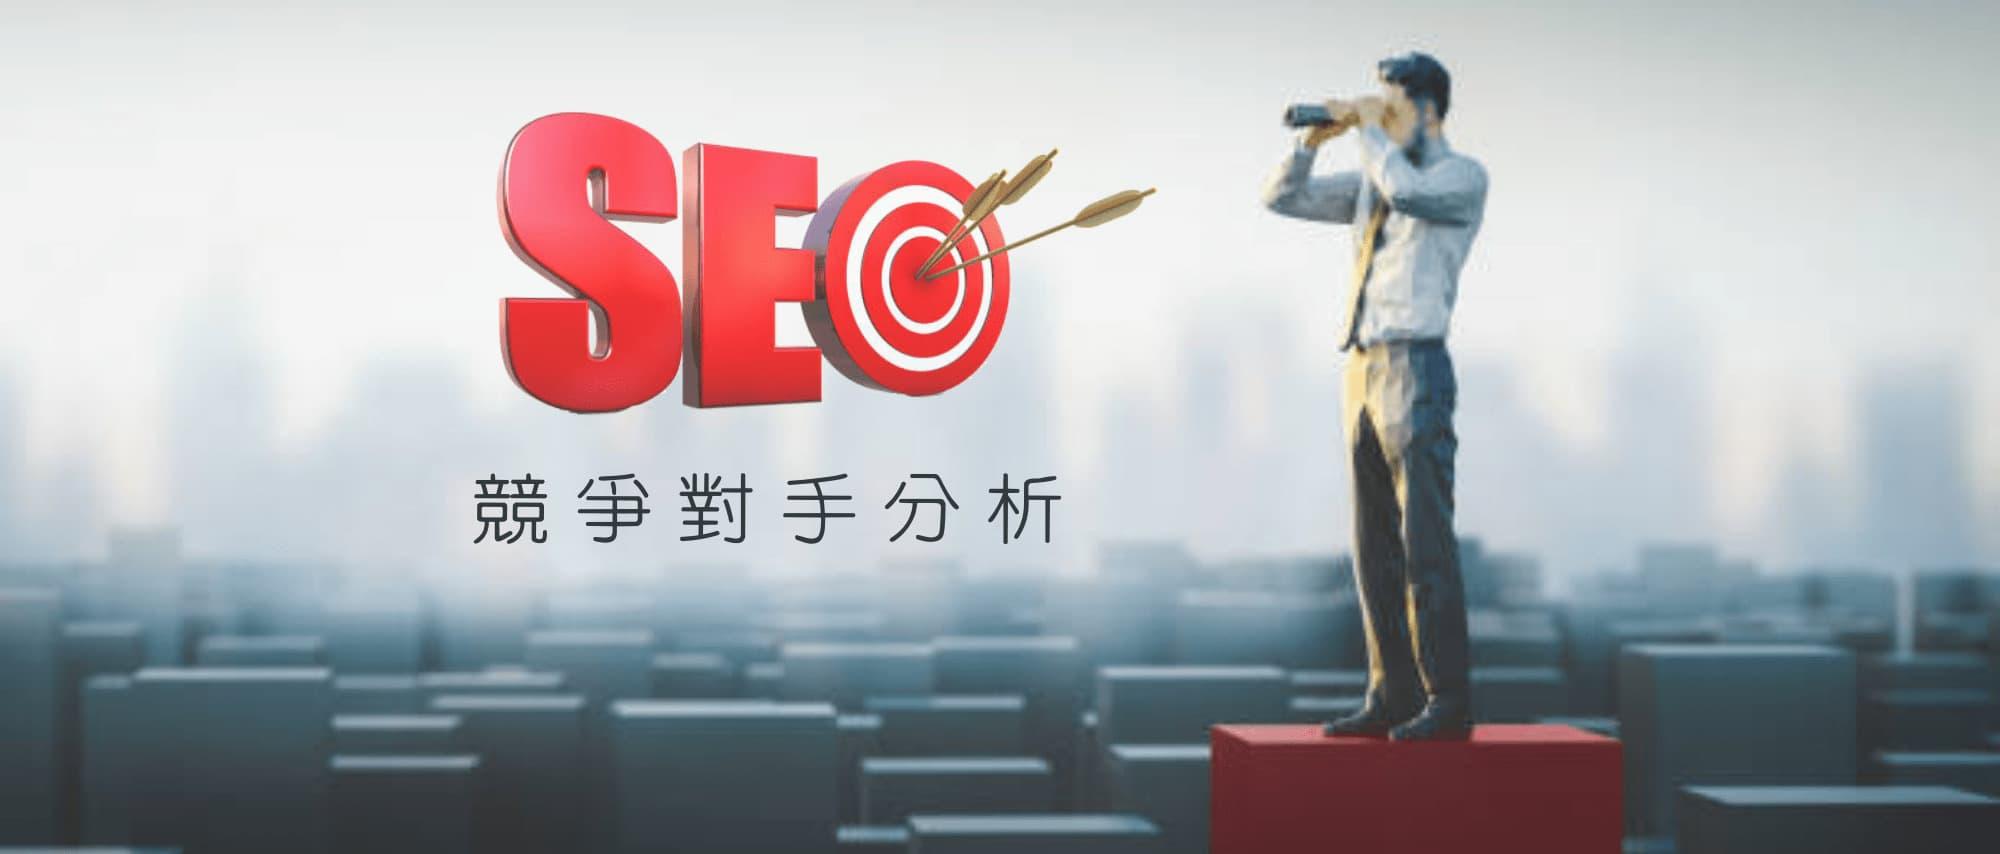 【SEO 教學】2款免費網站分析工具,了解競爭對手的SEO策略!